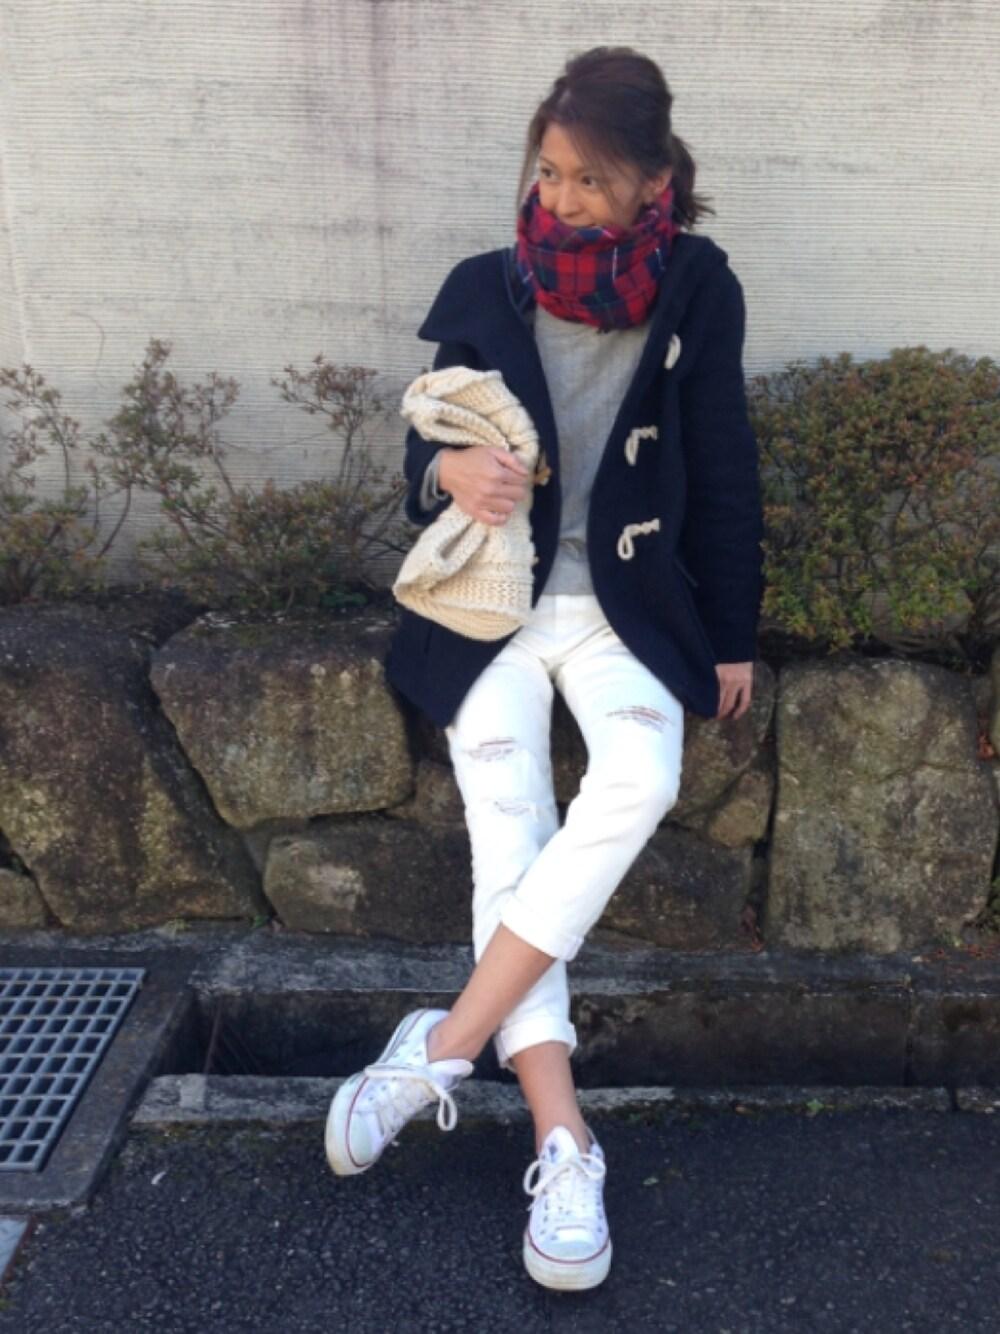 出典:http://wear.jp/yuko3776/5844619/